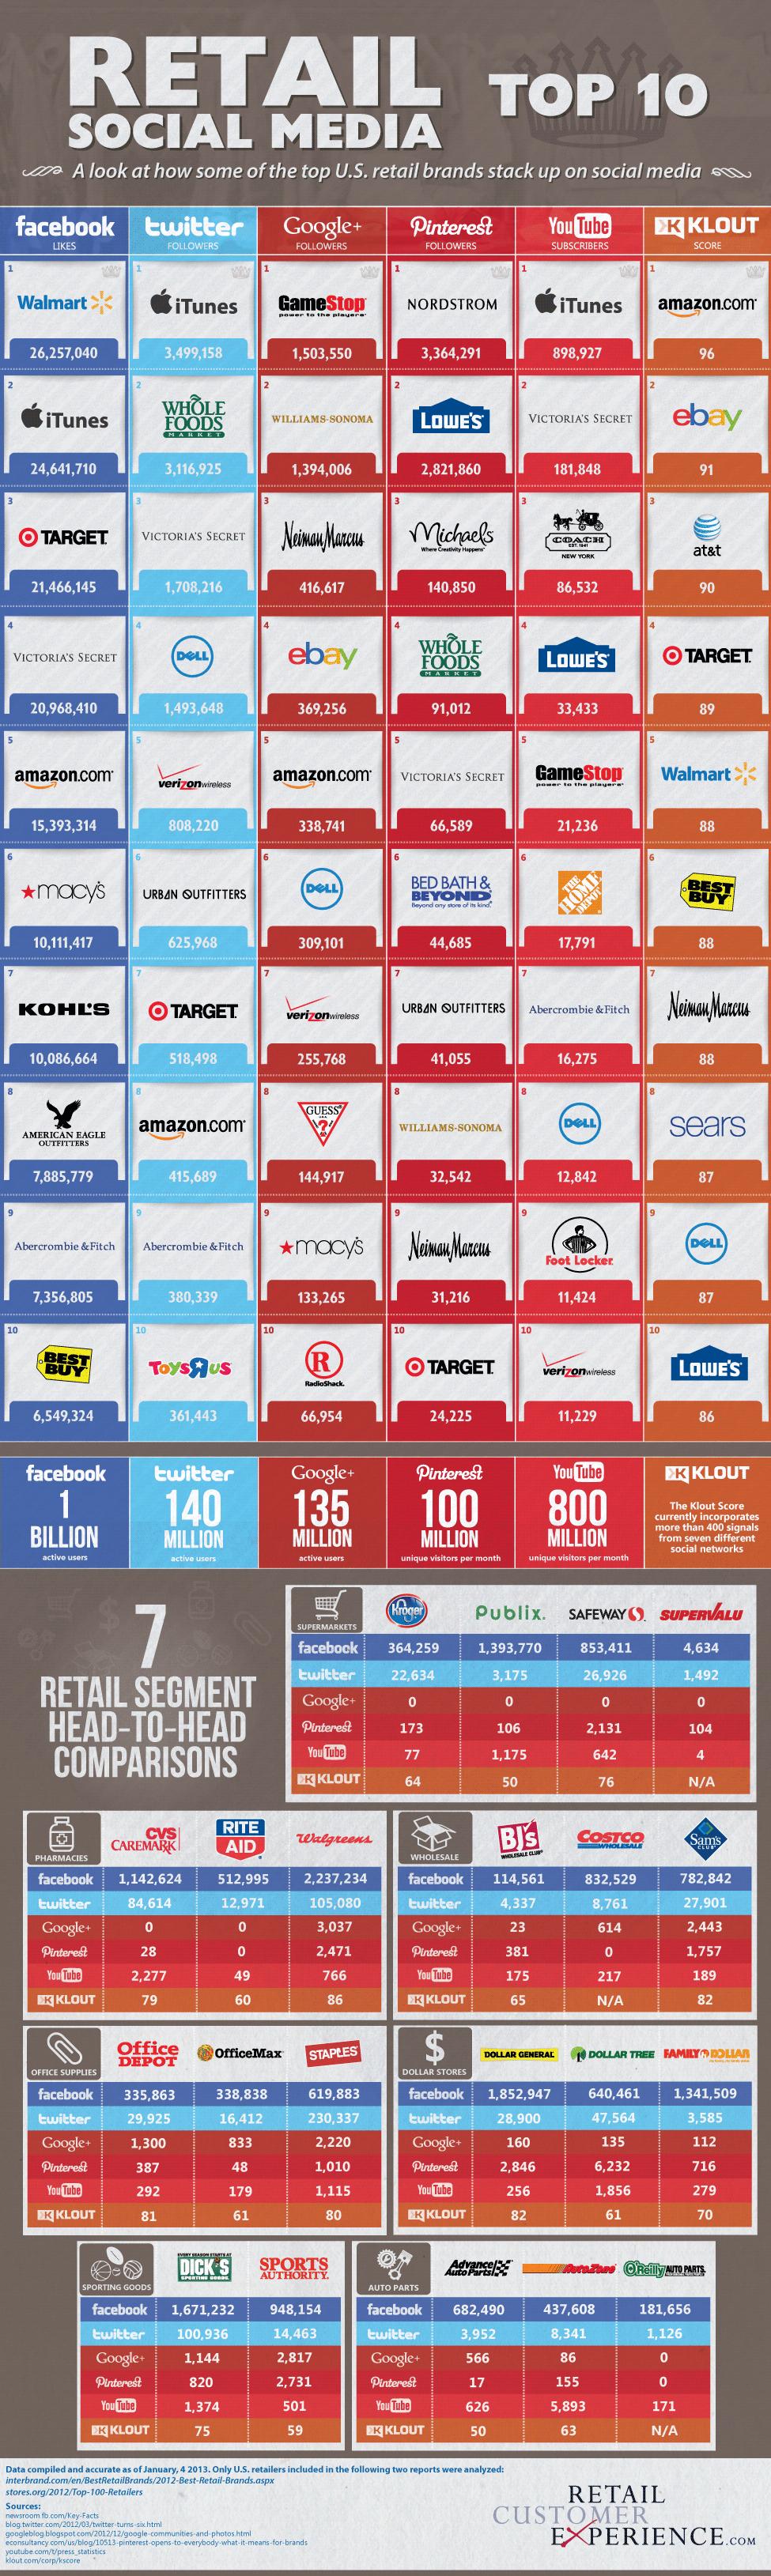 retail-social-media-top-10_50eee85a85e9c